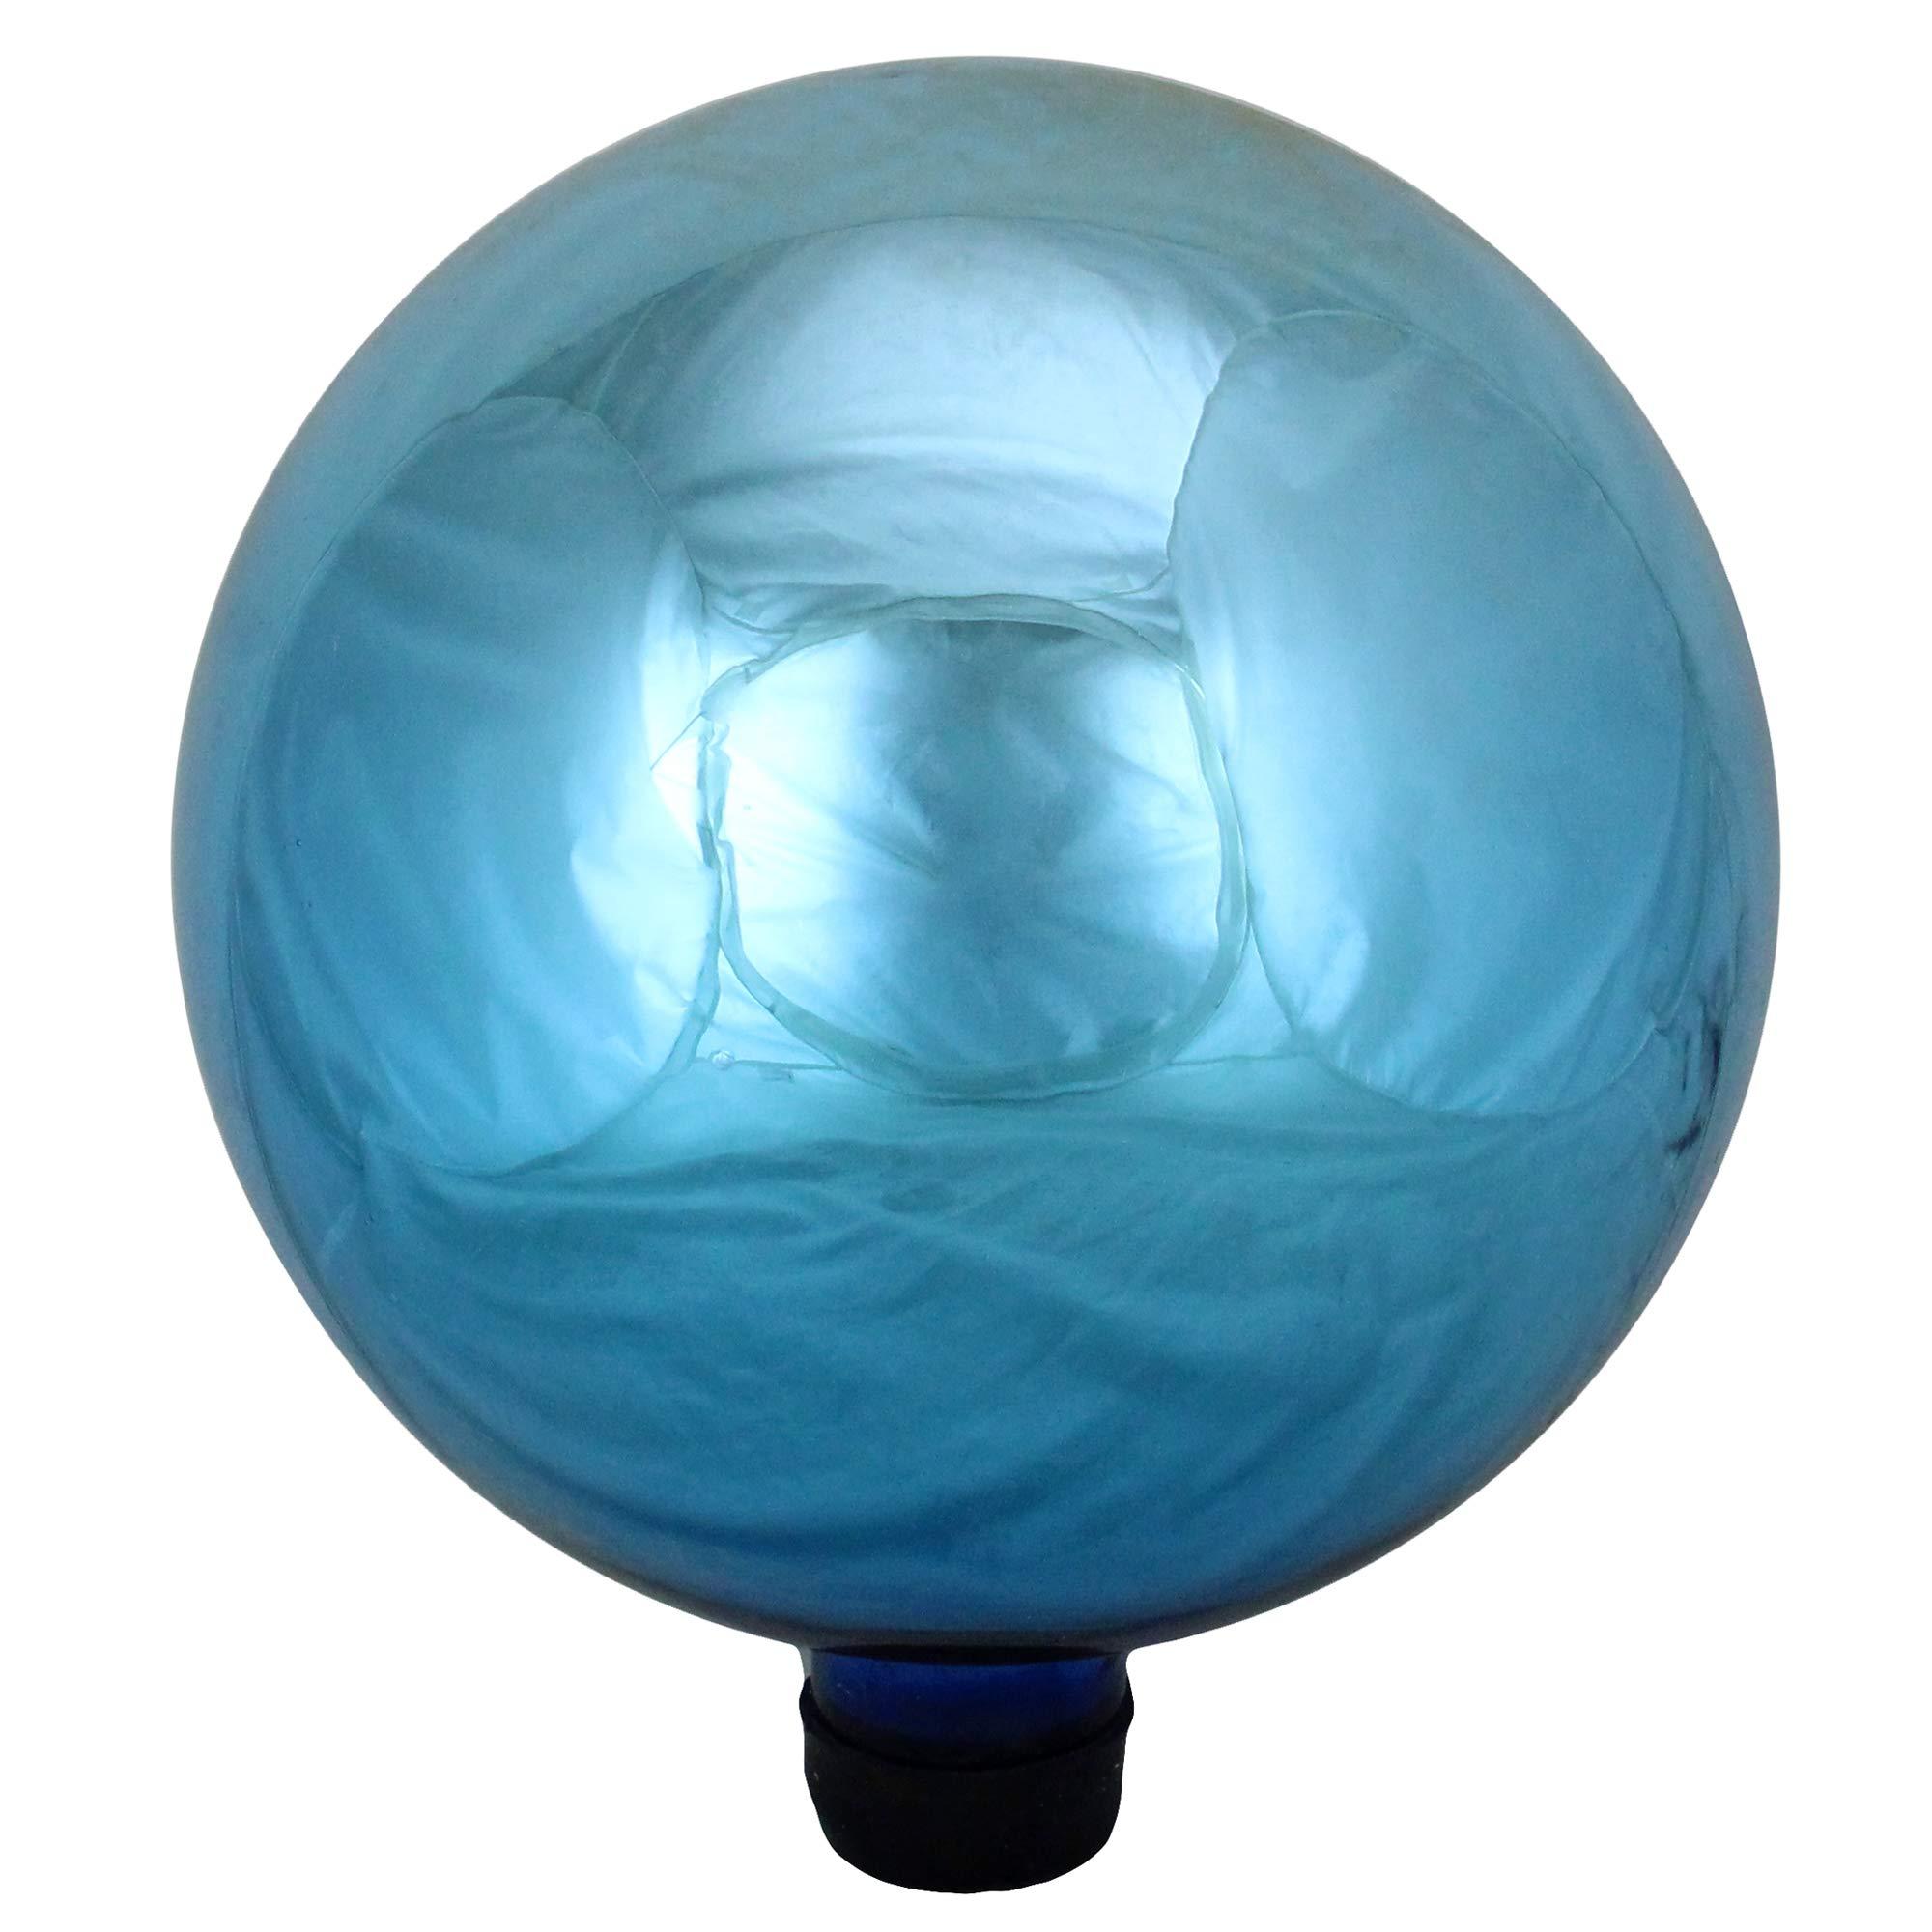 Northlight 10'' Shiny Turquoise Outdoor Patio Garden Gazing Ball